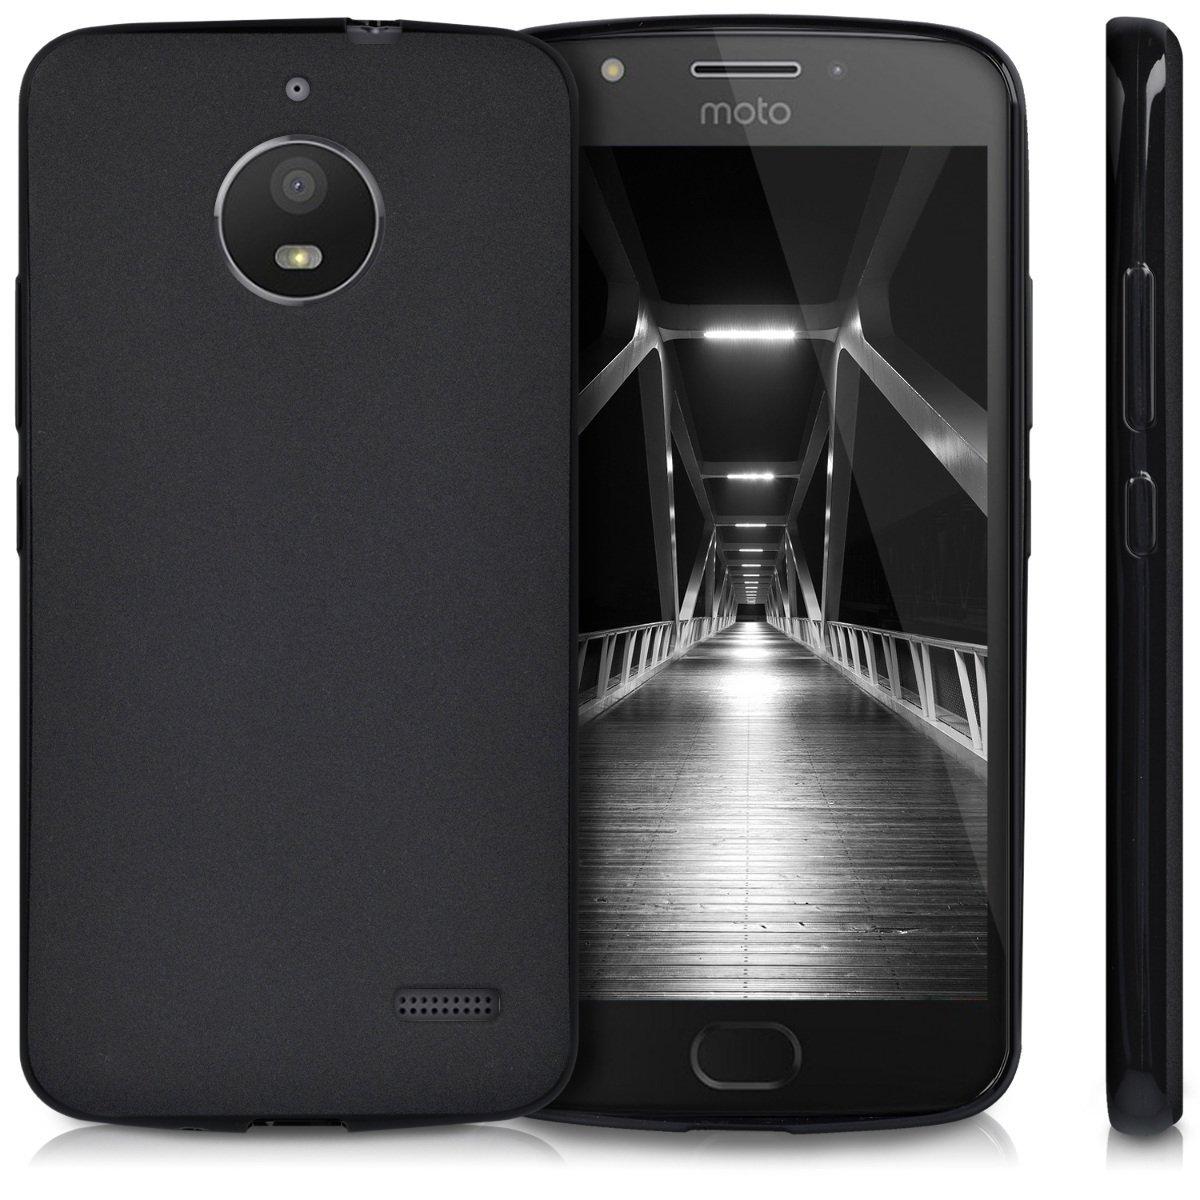 KW Θήκη Σιλικόνης Motorola Moto E4 - Black (42352.47)